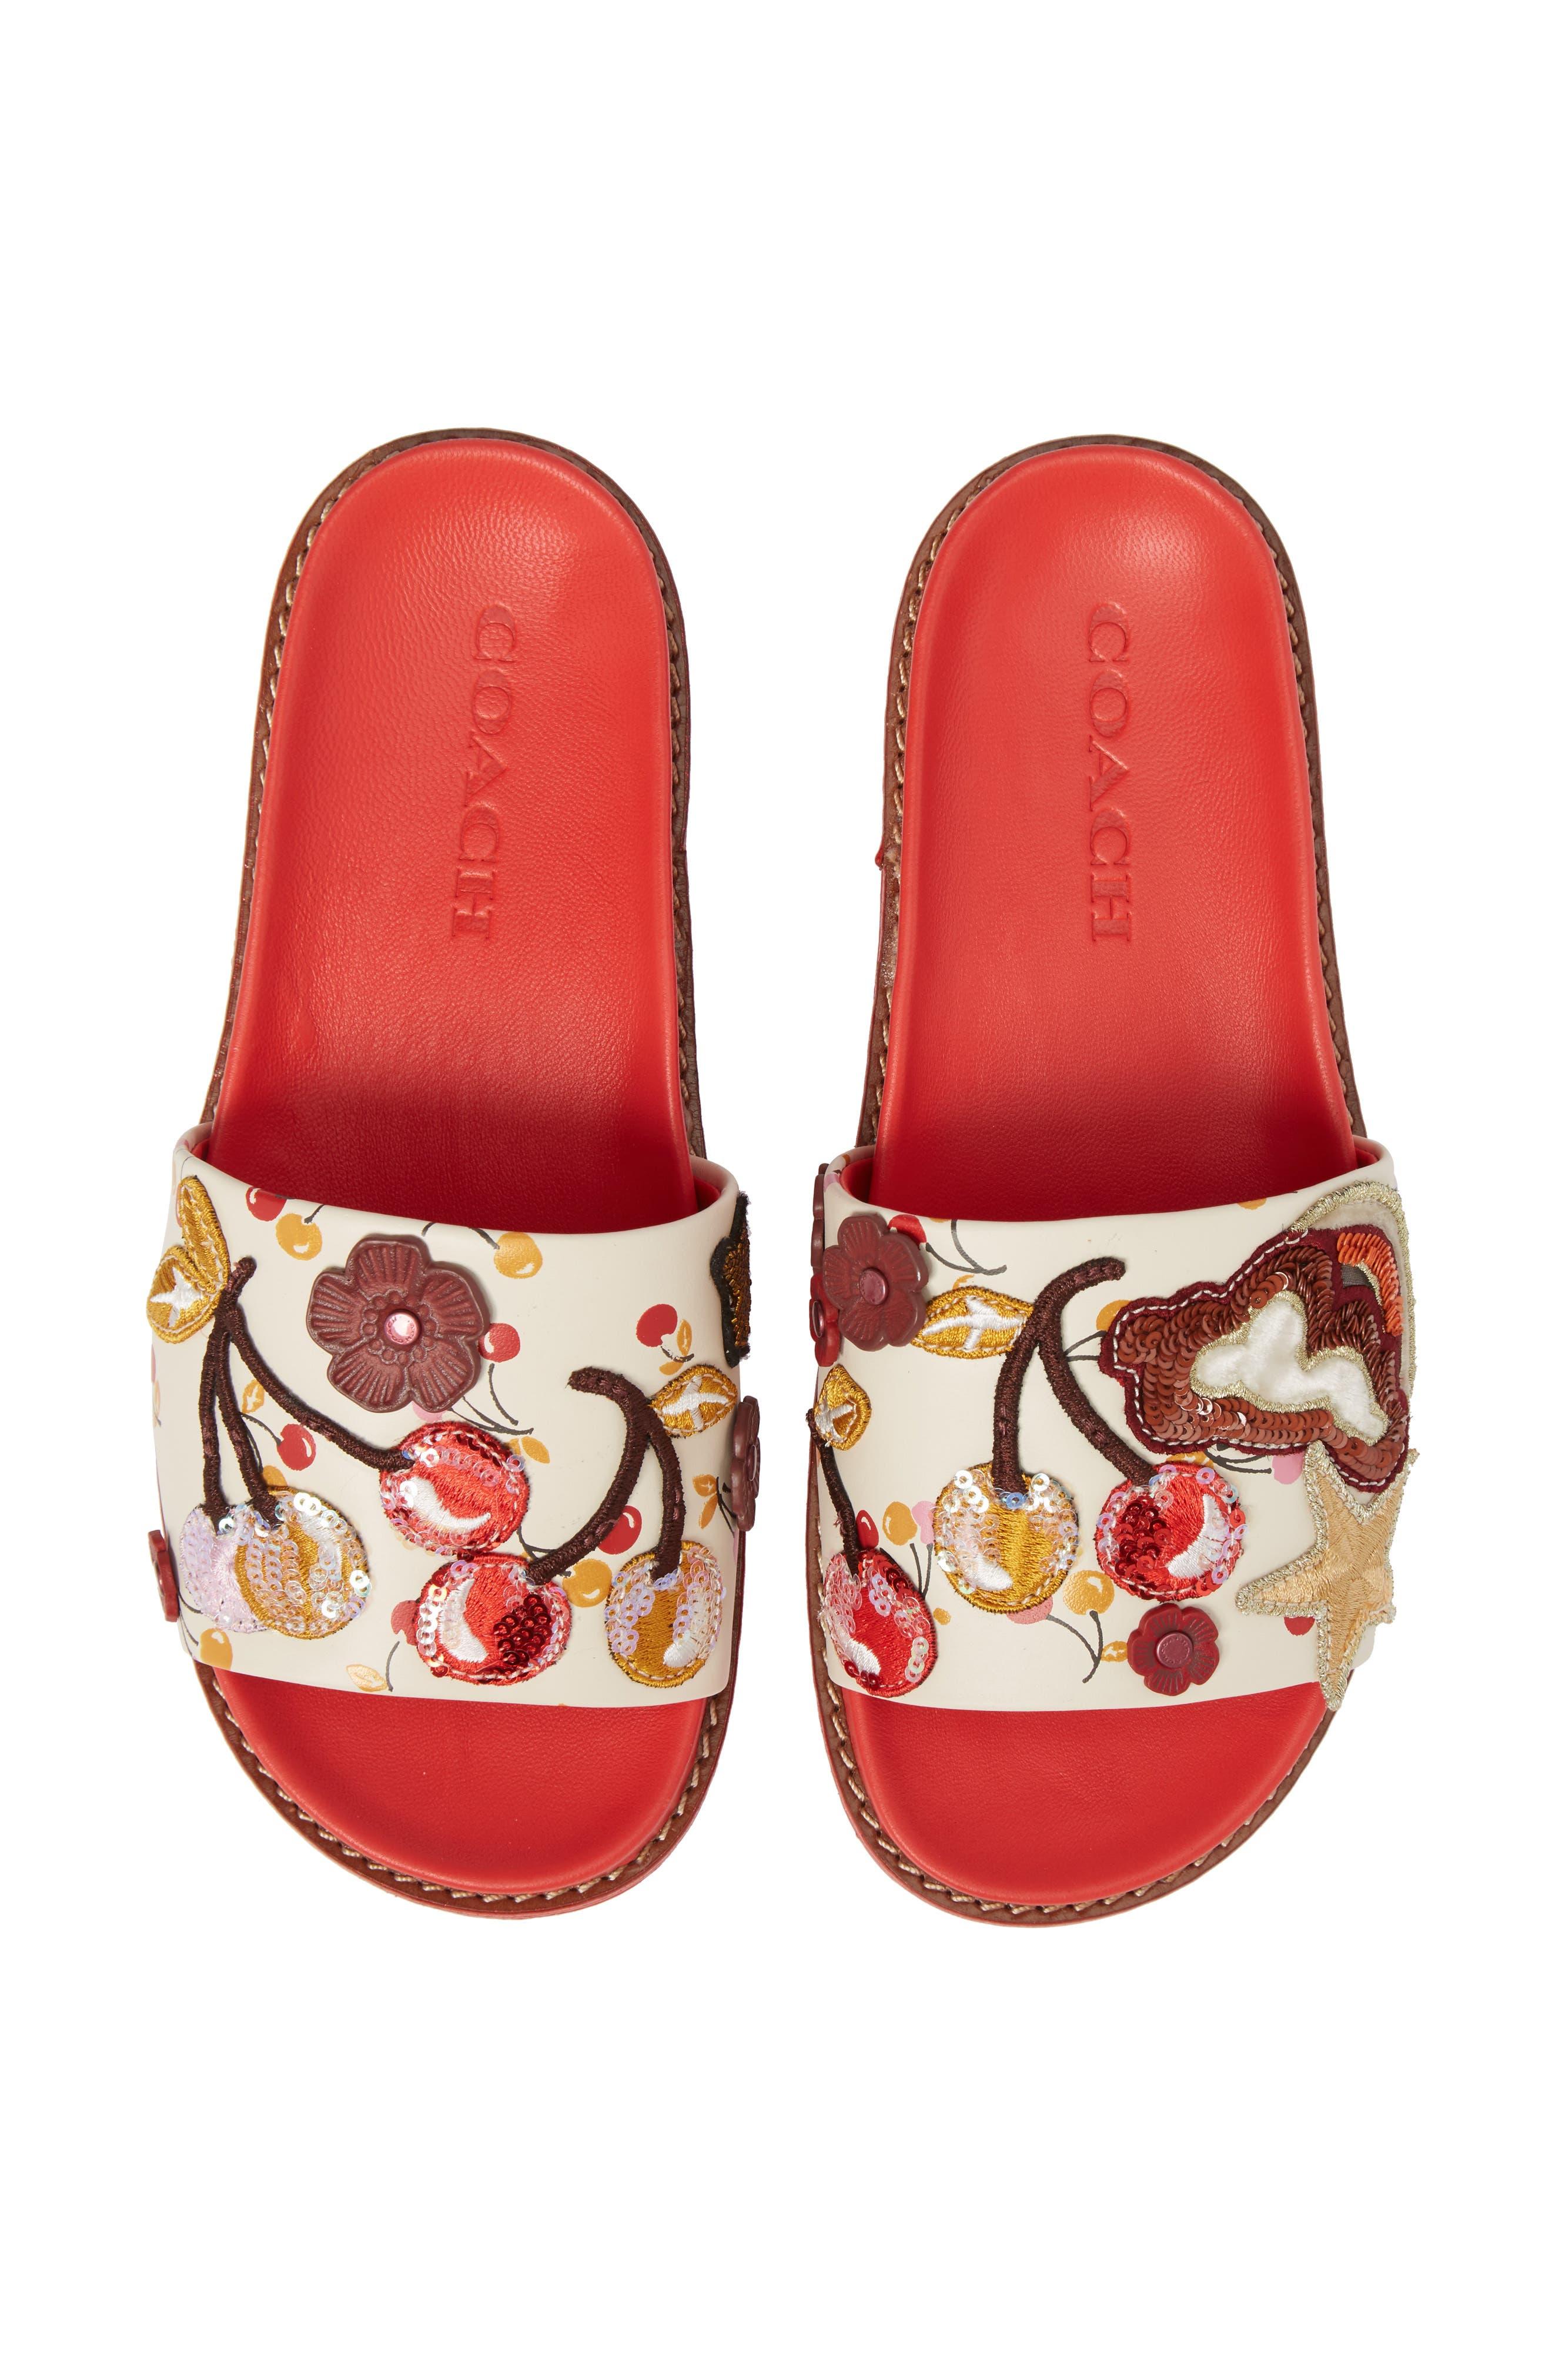 Patch Sport Slide Sandal,                             Alternate thumbnail 5, color,                             Ivory/ Red Leather